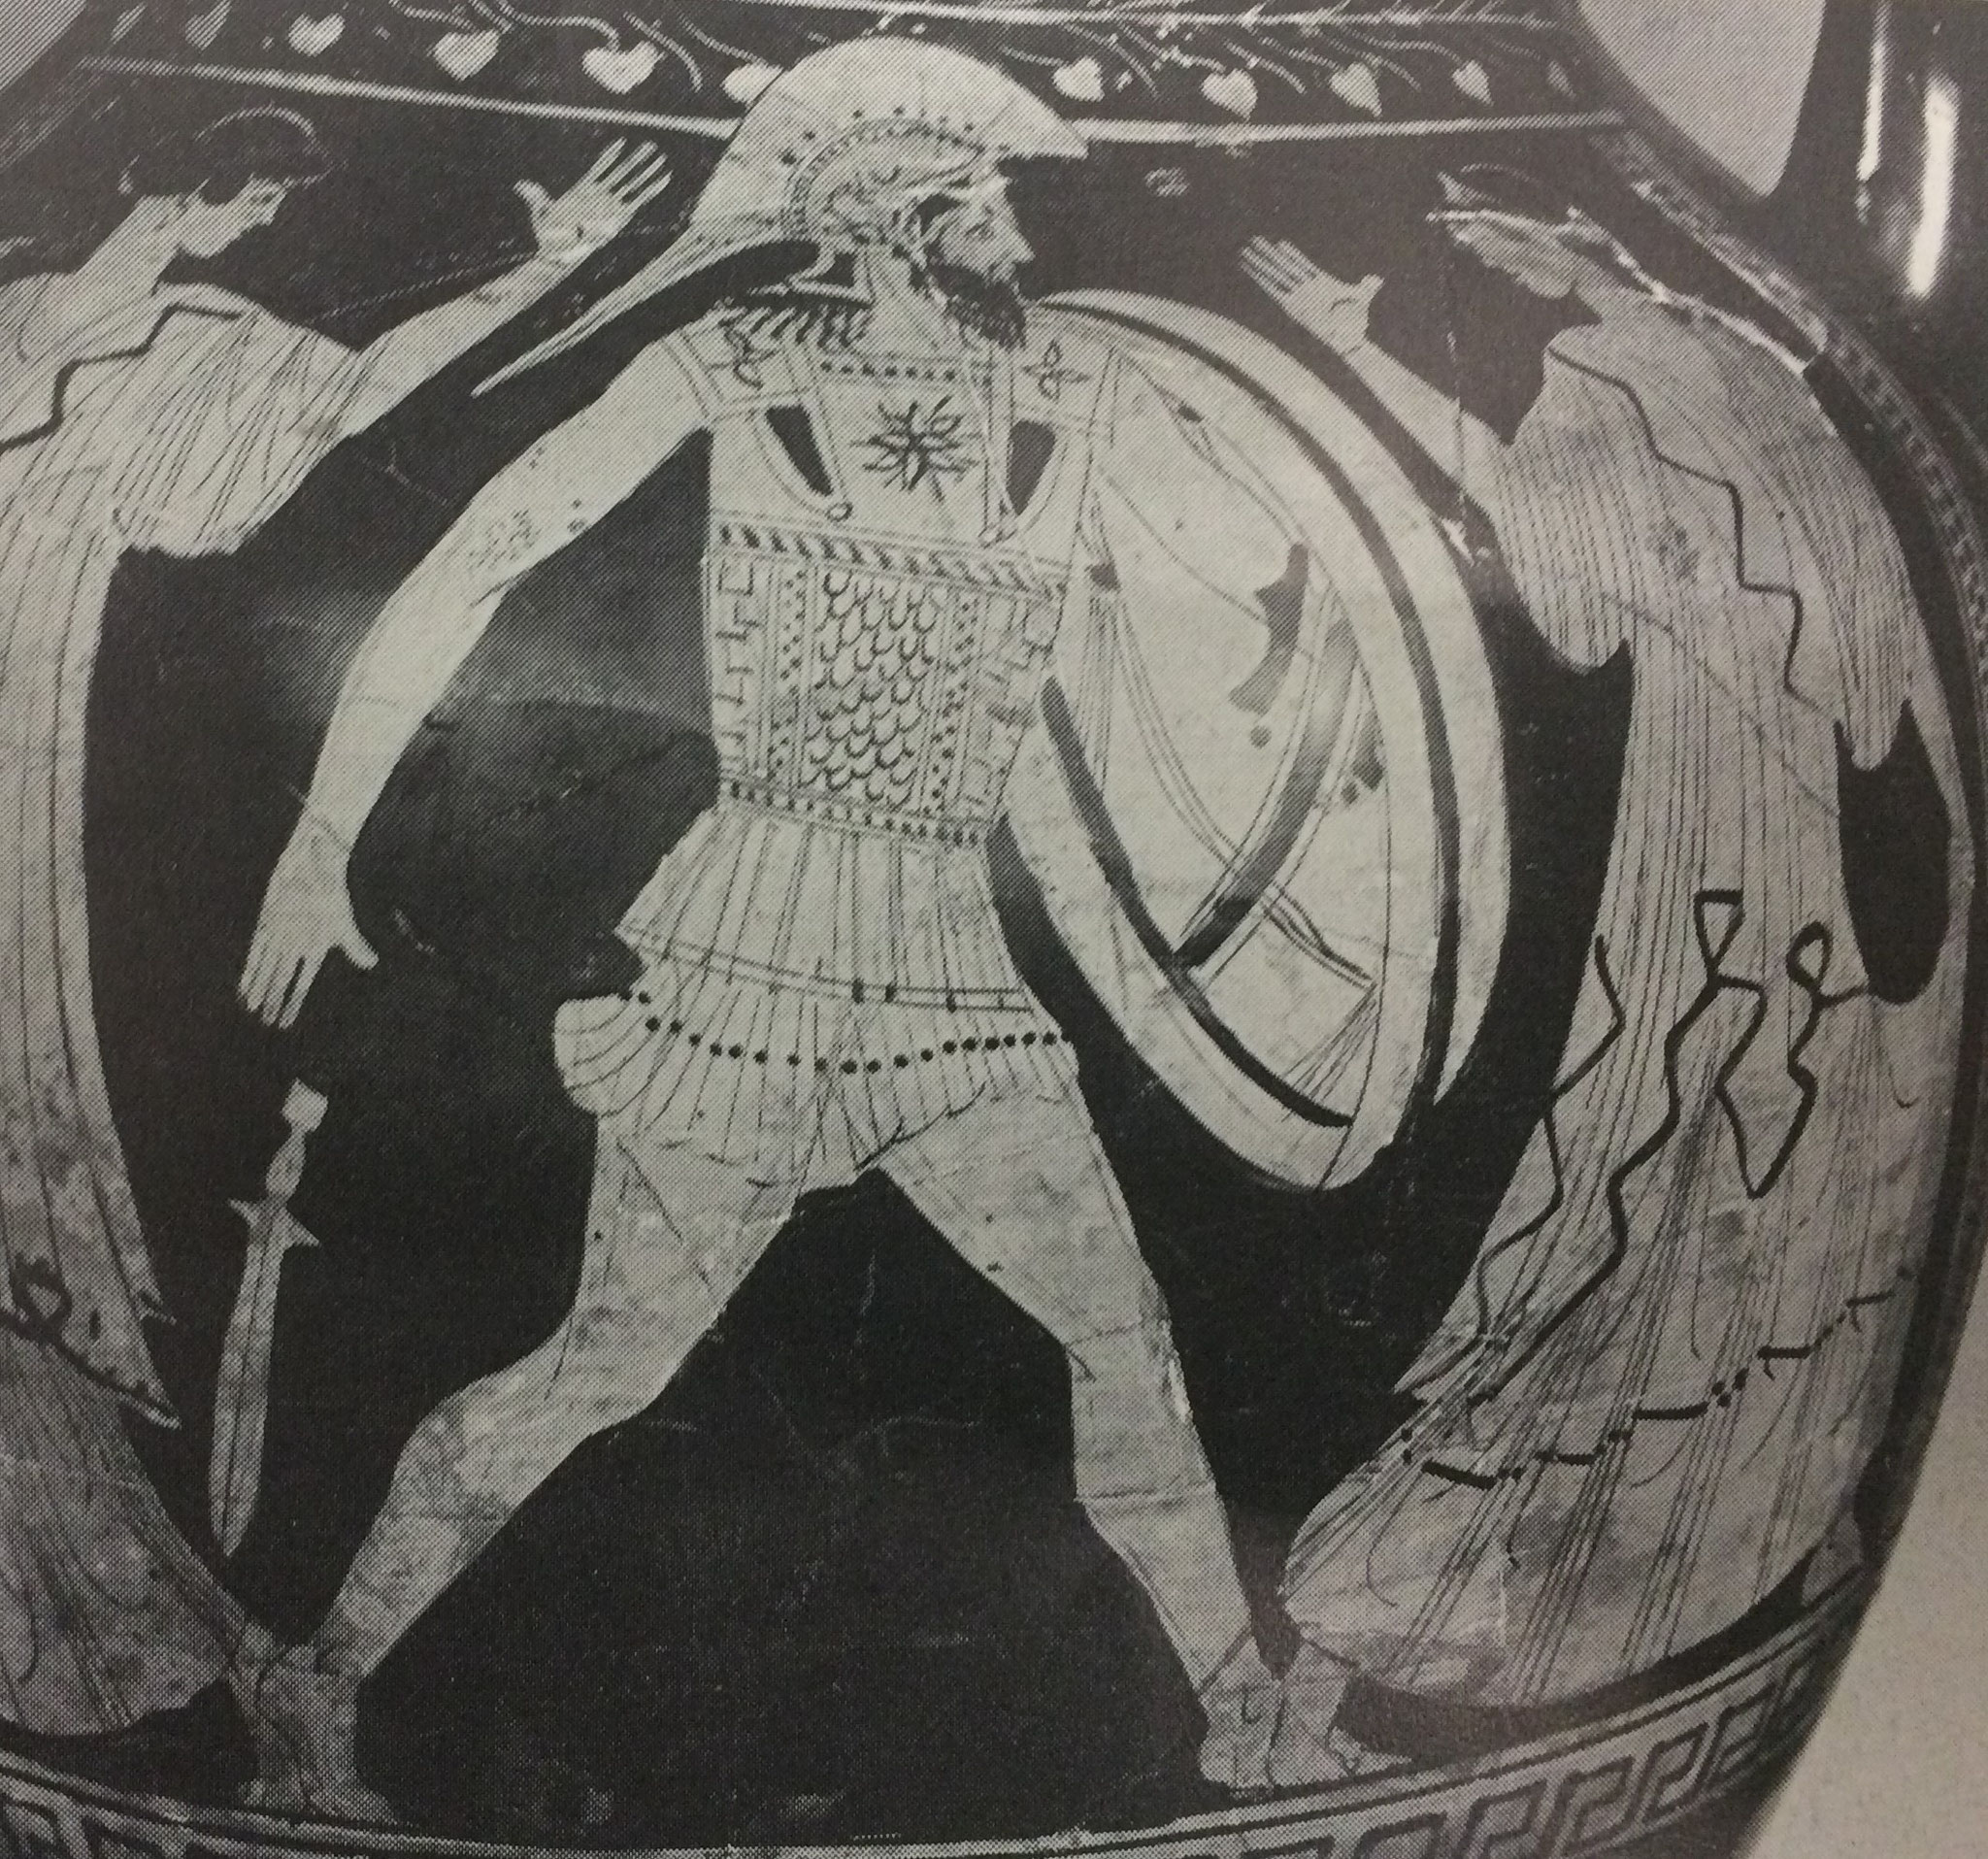 Abb. 6: British Museum London, 470 v. Chr.